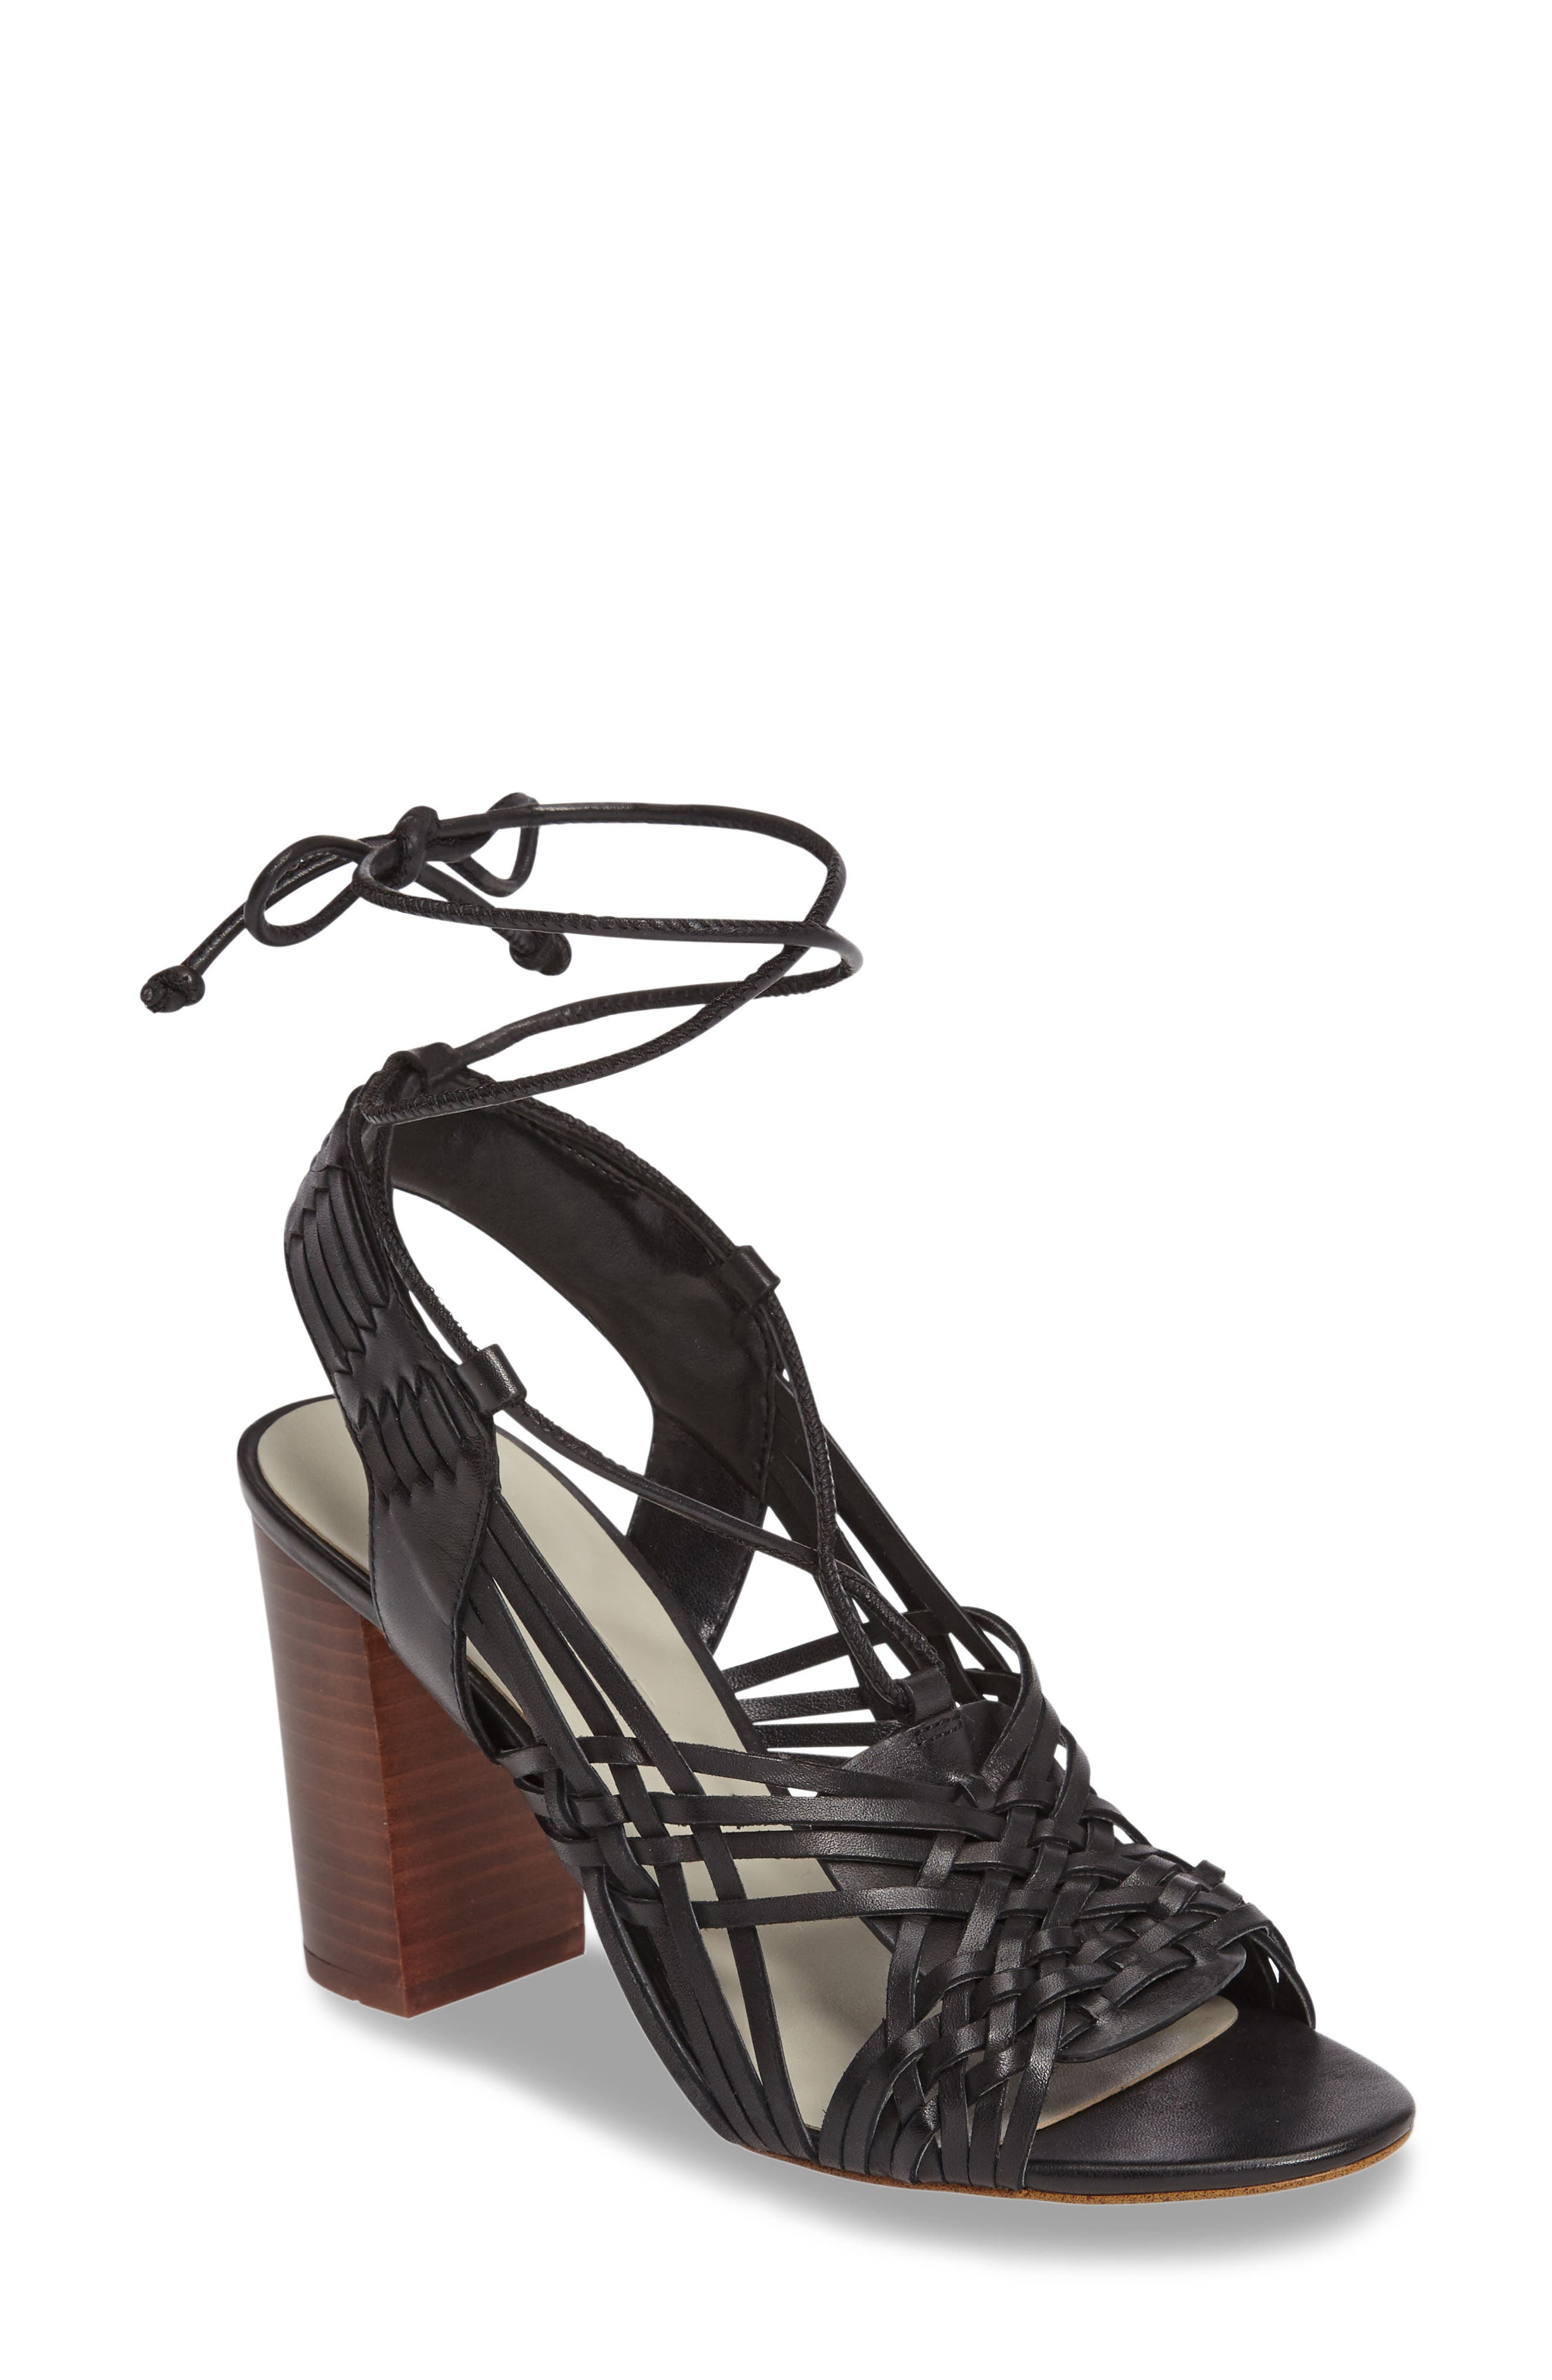 Shannen Block Heel Sandal,                         Main,                         color, 001